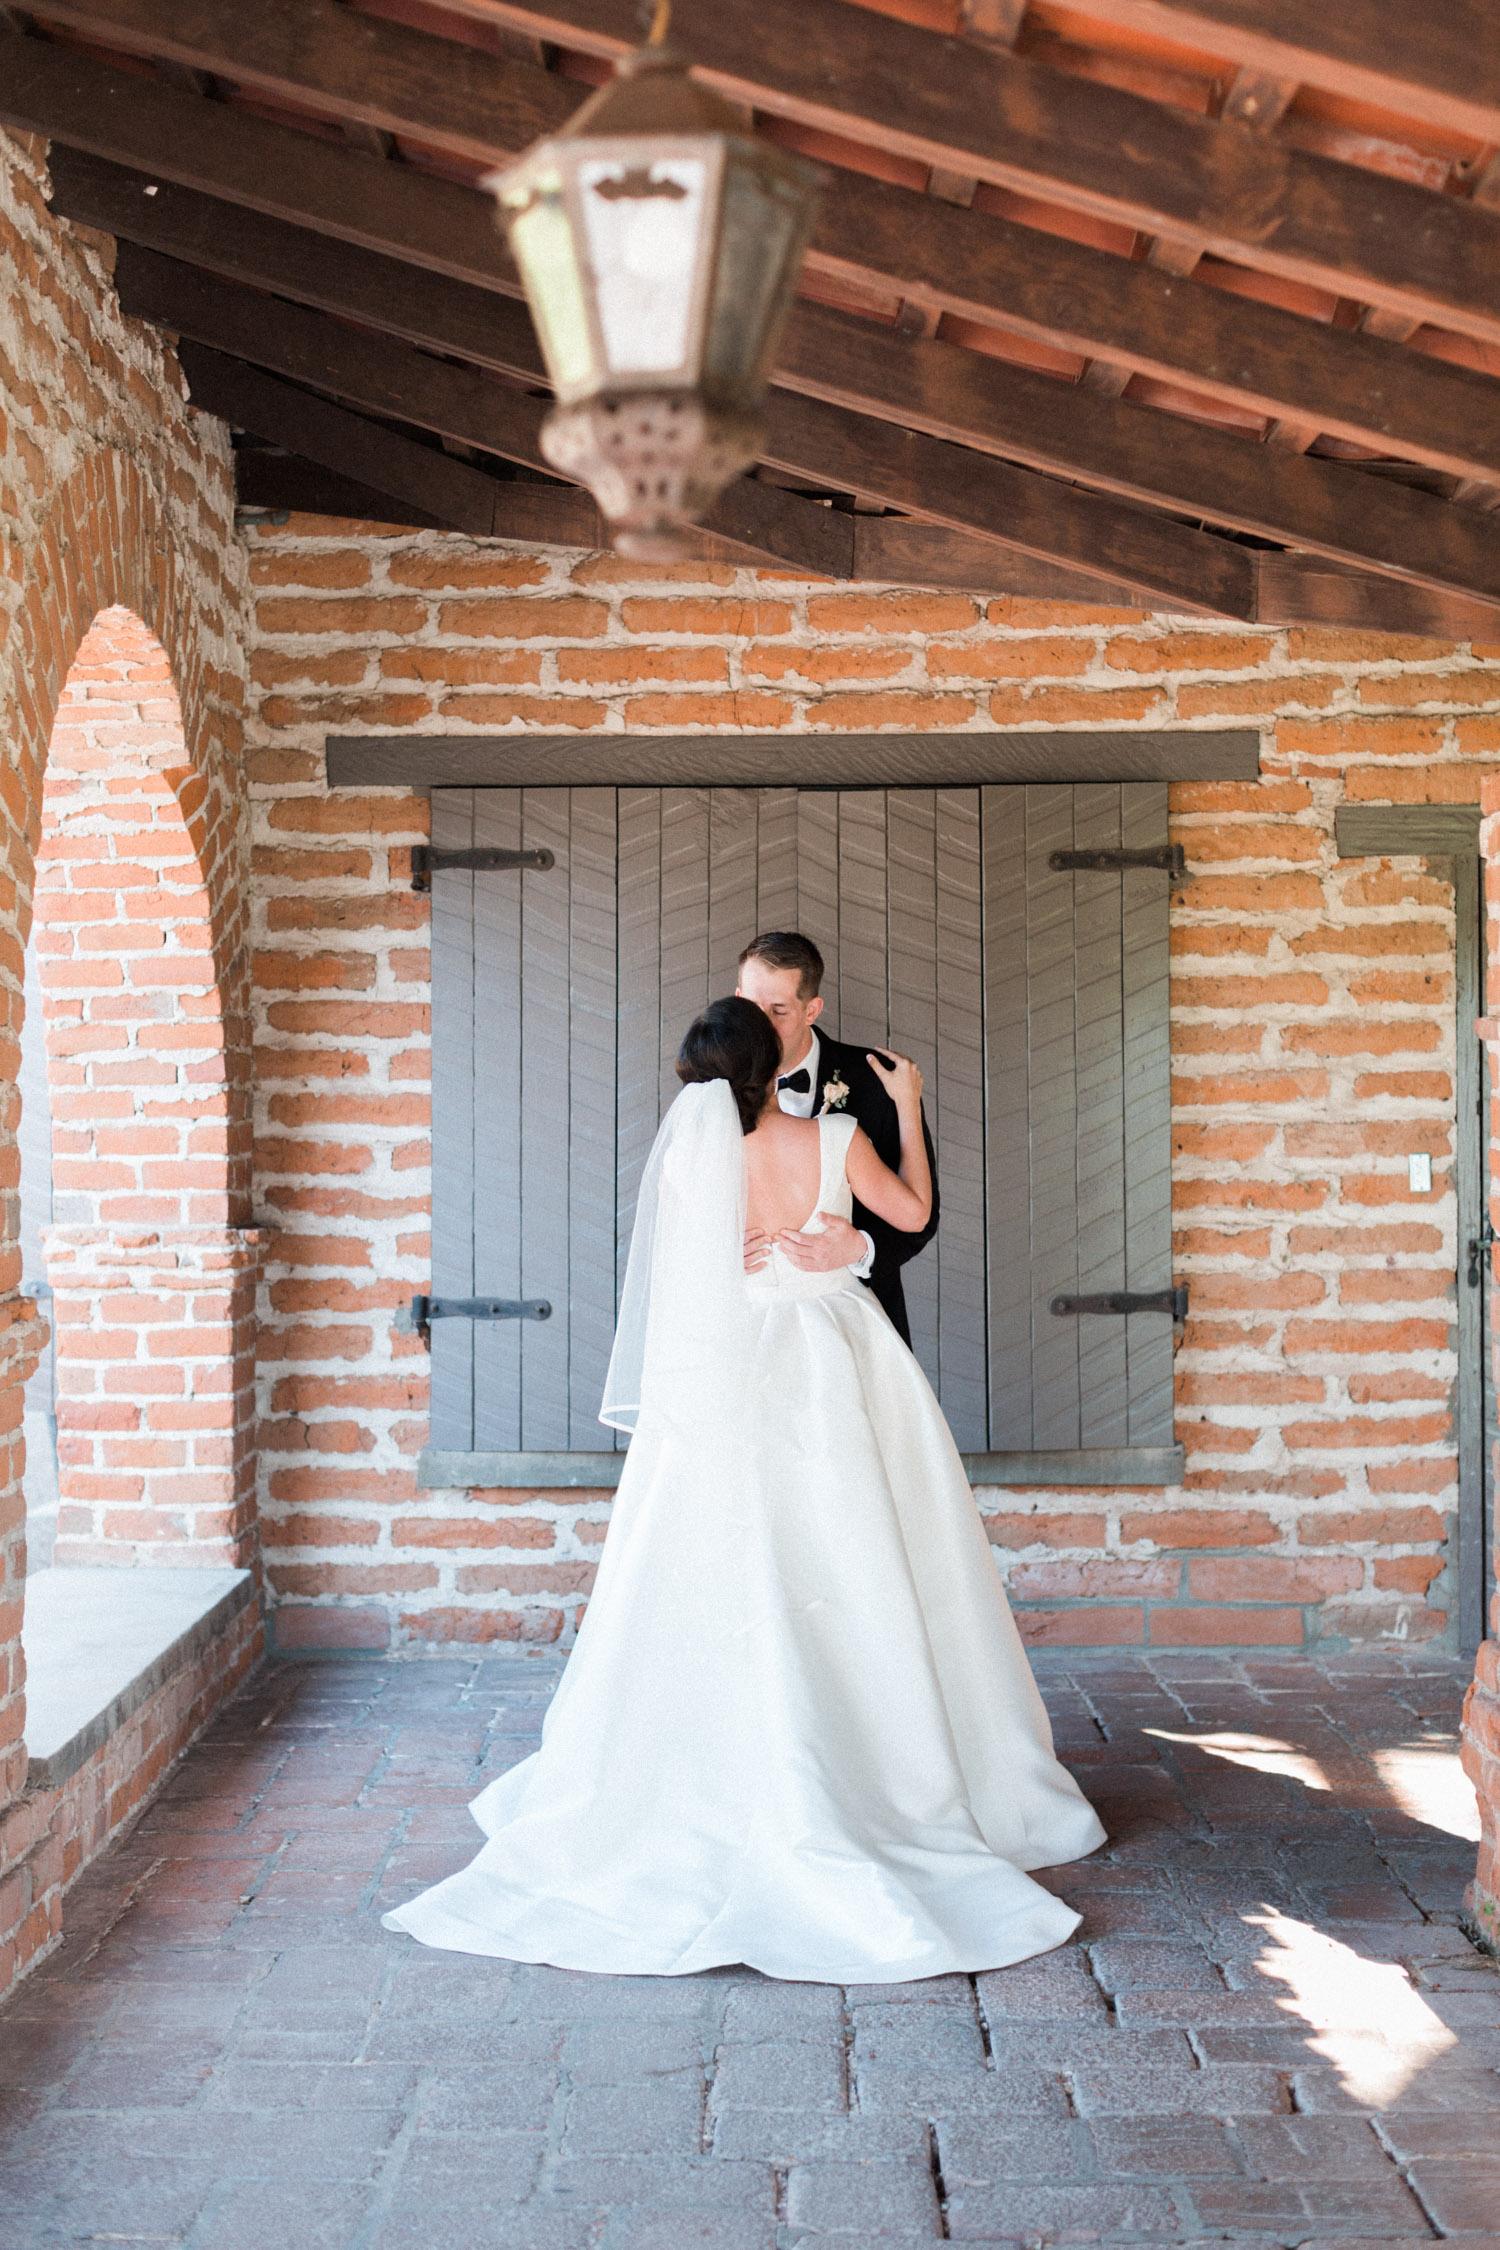 Bride and groom kiss at their Tubac Golf Resort wedding